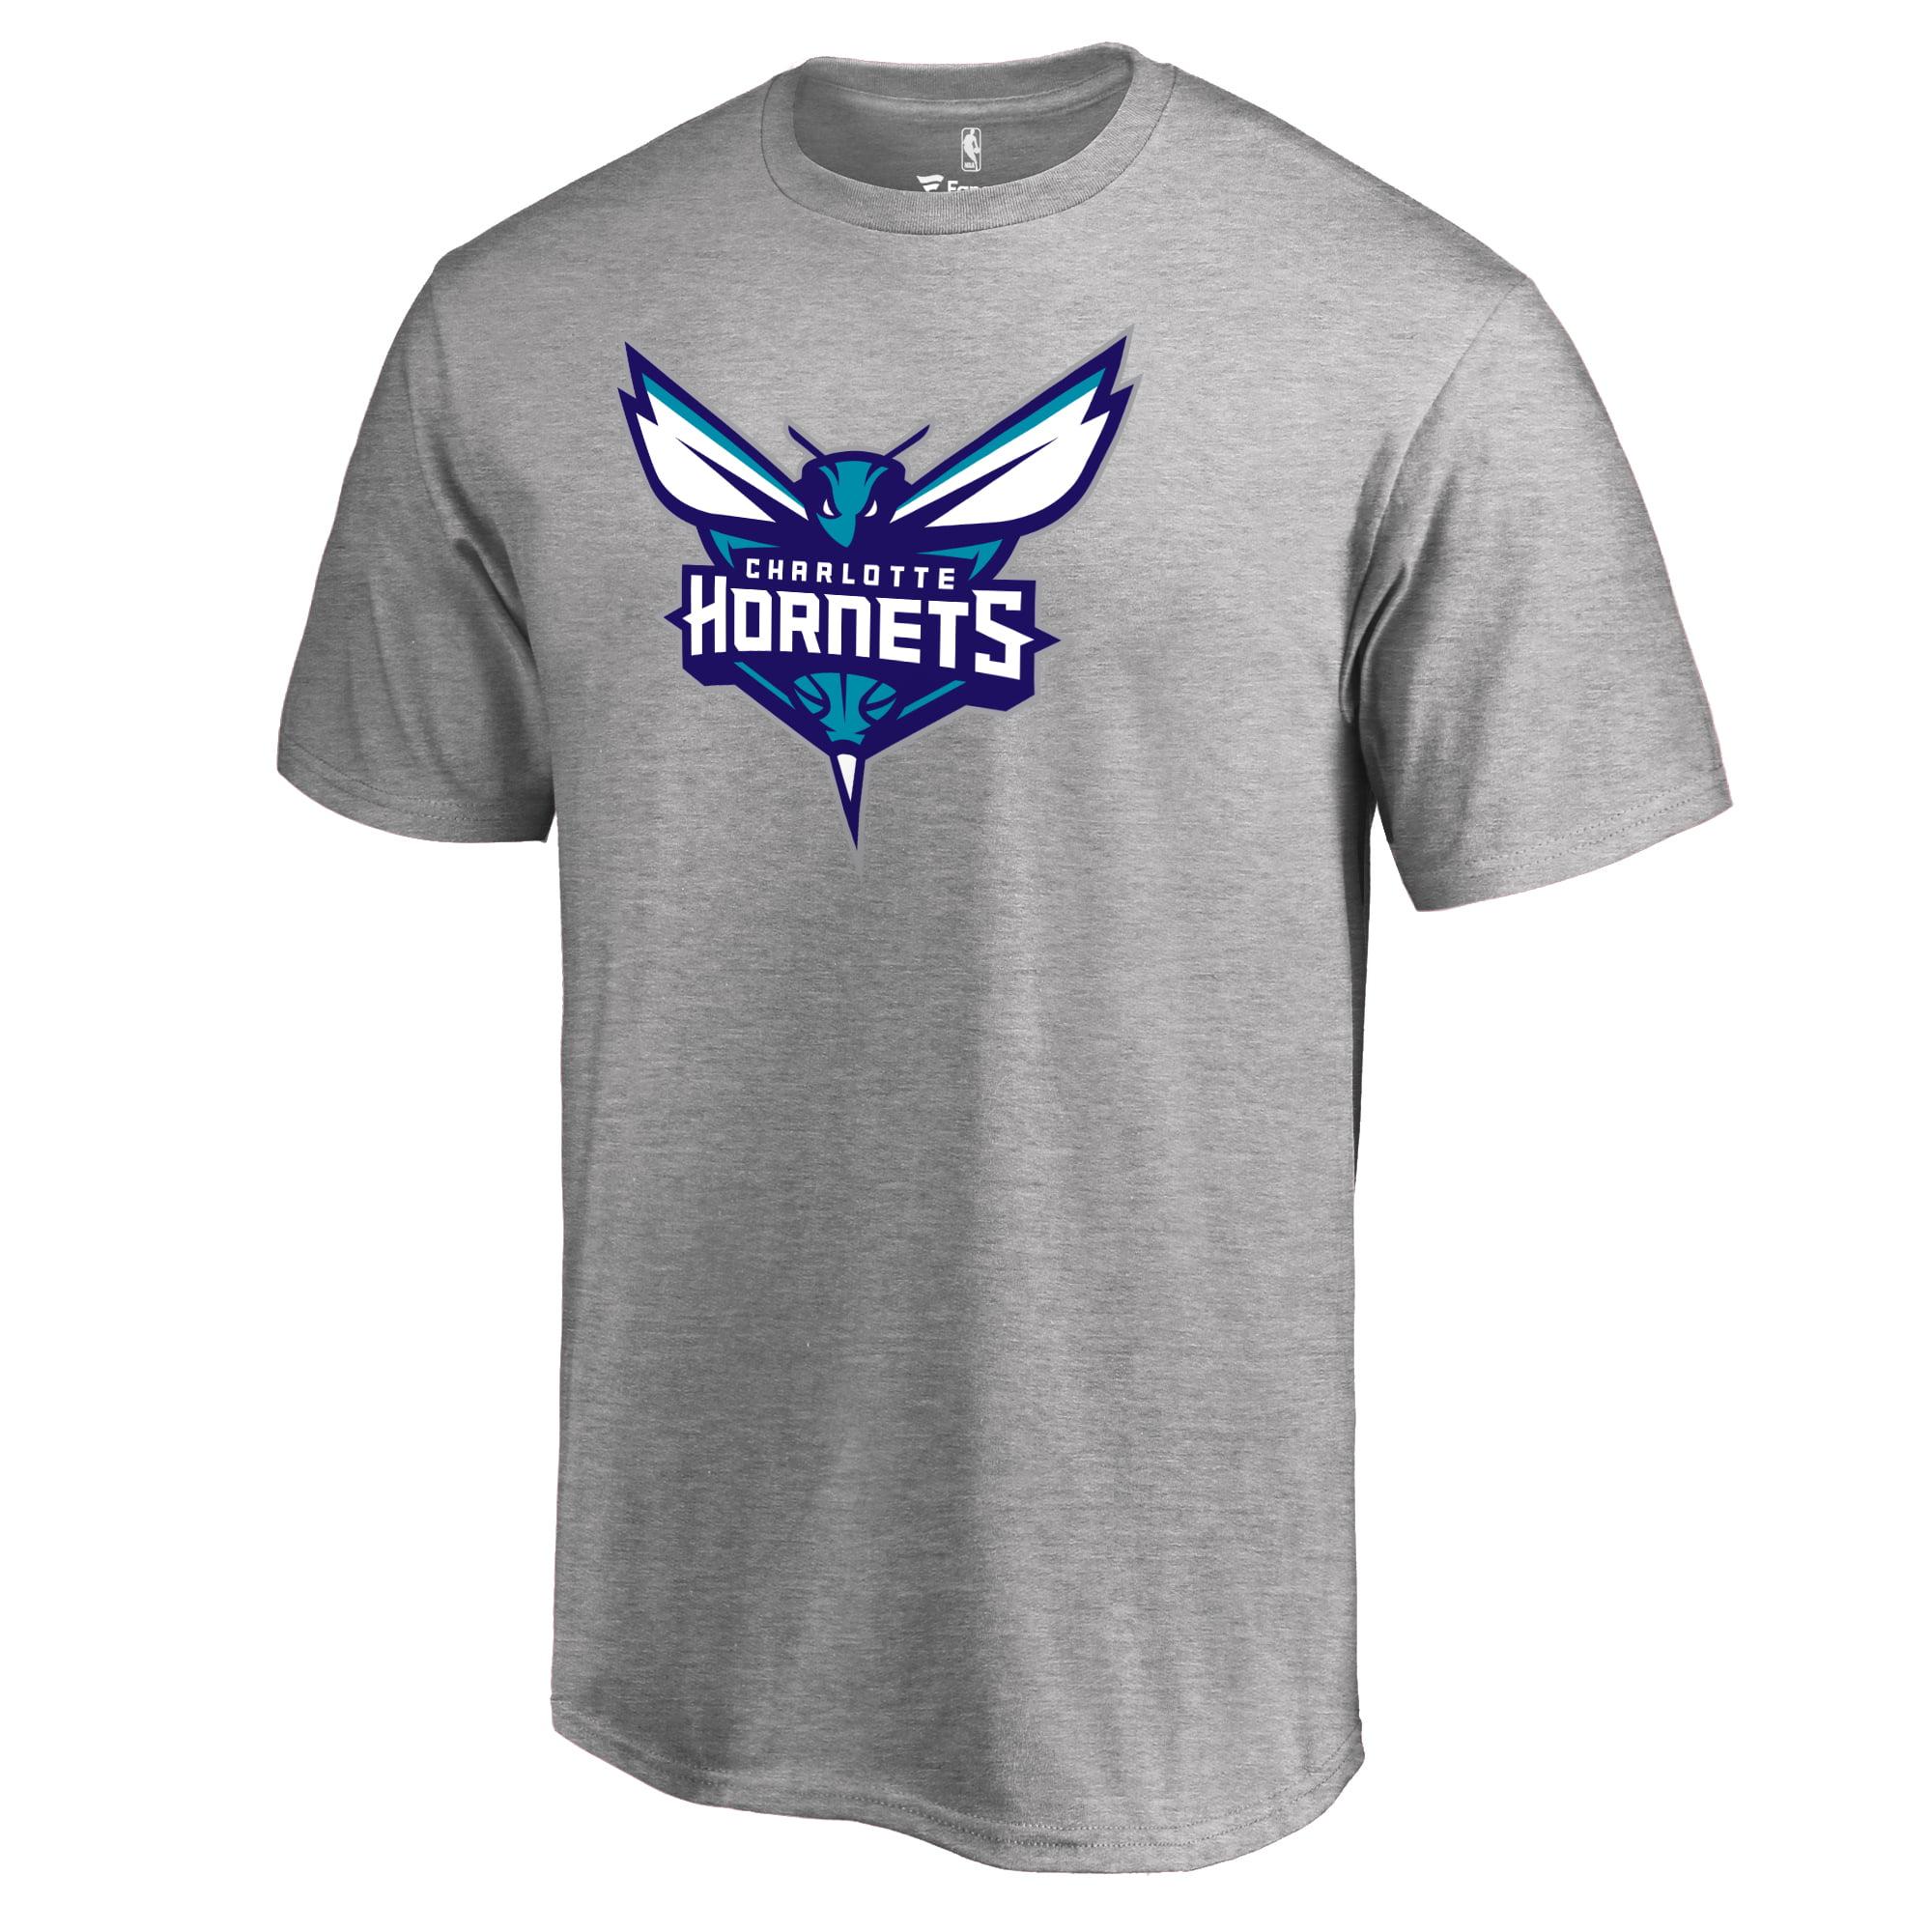 ff1de438b15 Charlotte Hornets Fanatics Branded Primary Logo T-Shirt - Heather Gray -  Walmart.com